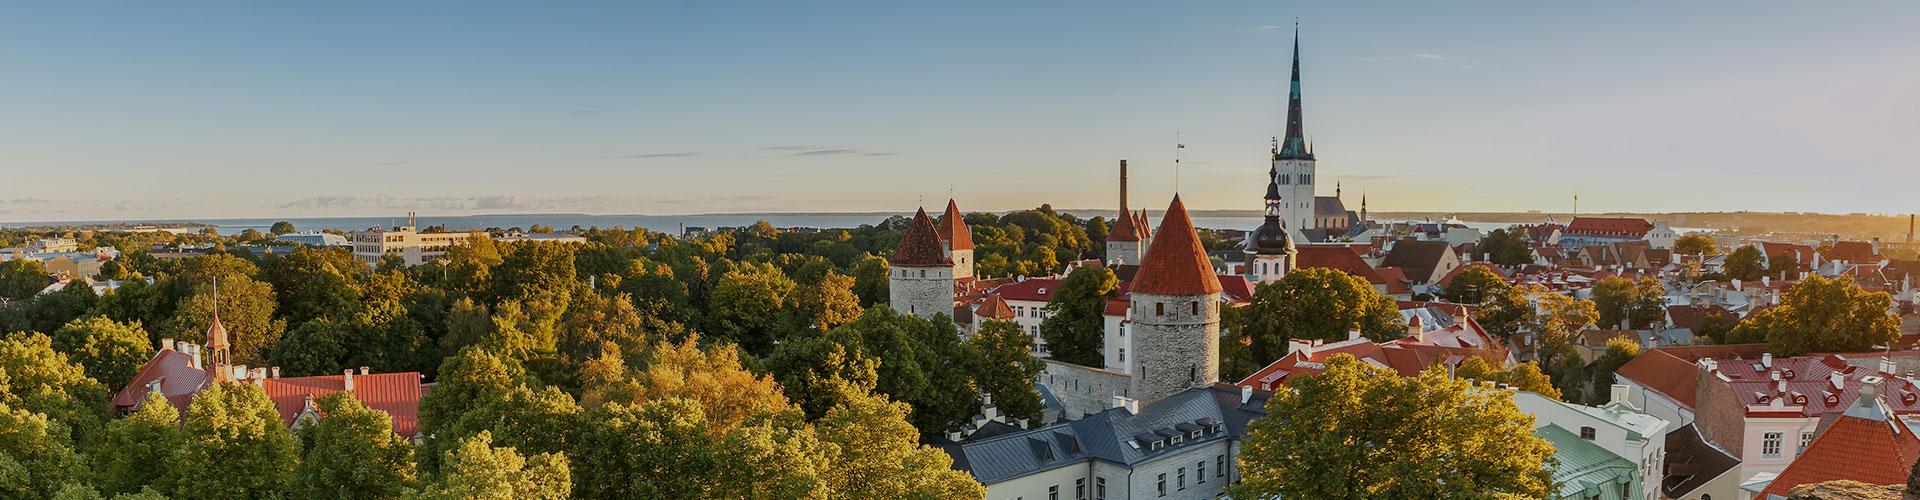 Landmark photograph of Estonia